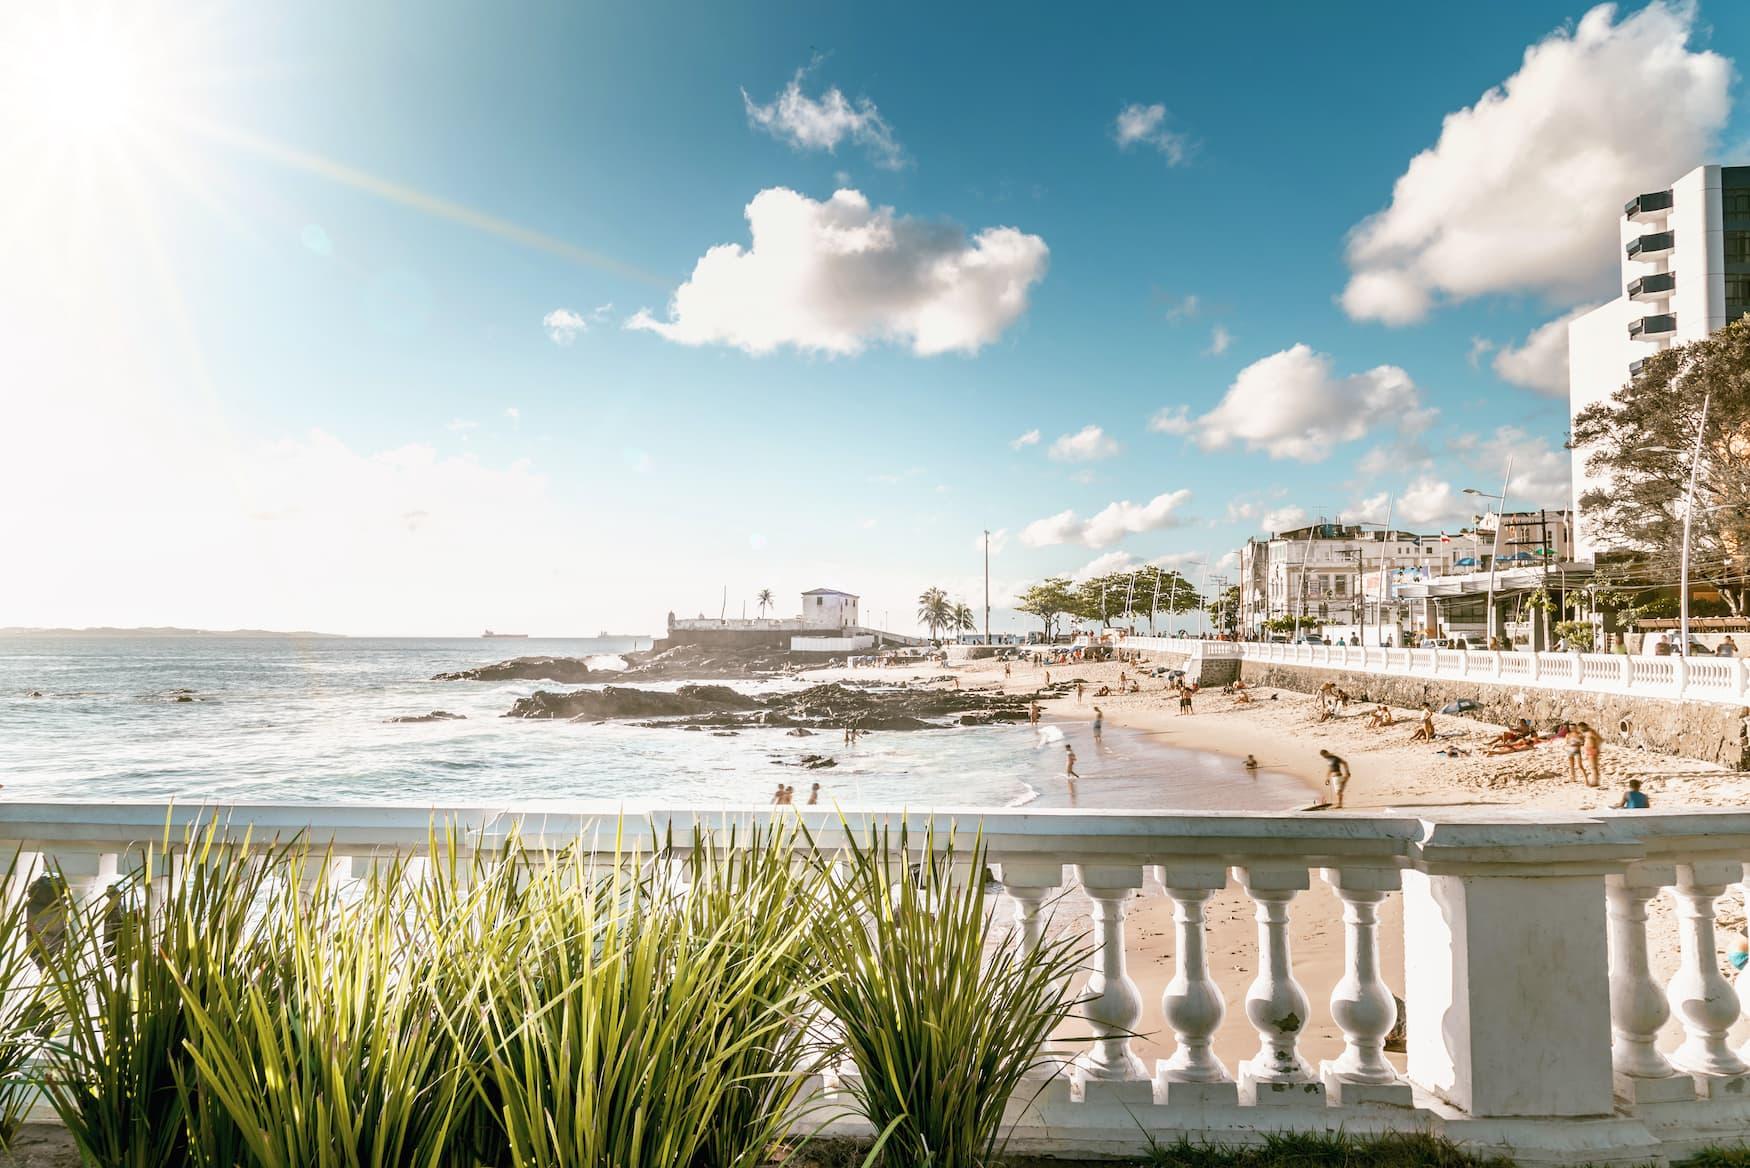 Stadtstrand in Salvador da Bahia bei Sonnenschein